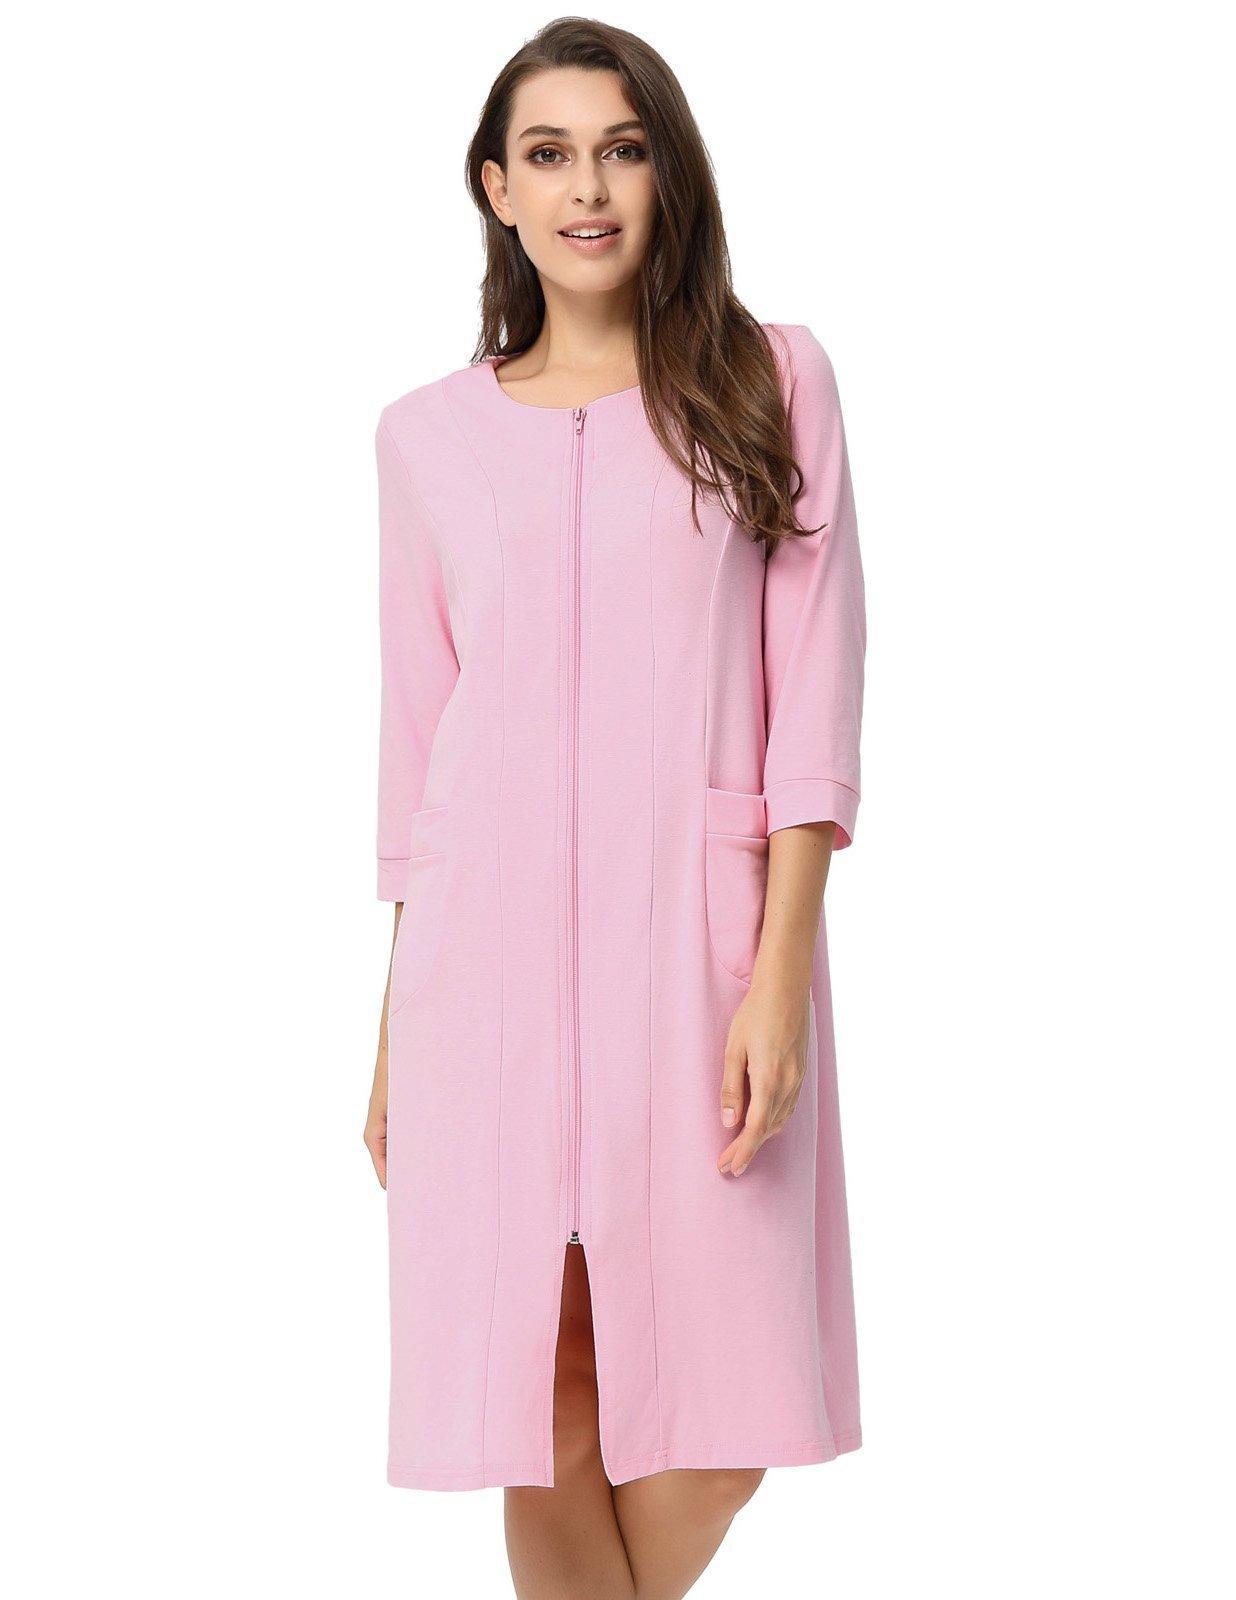 Zexxxy Women's Plus Size Robe Pyjama for Summer House Wear Pink 2XL